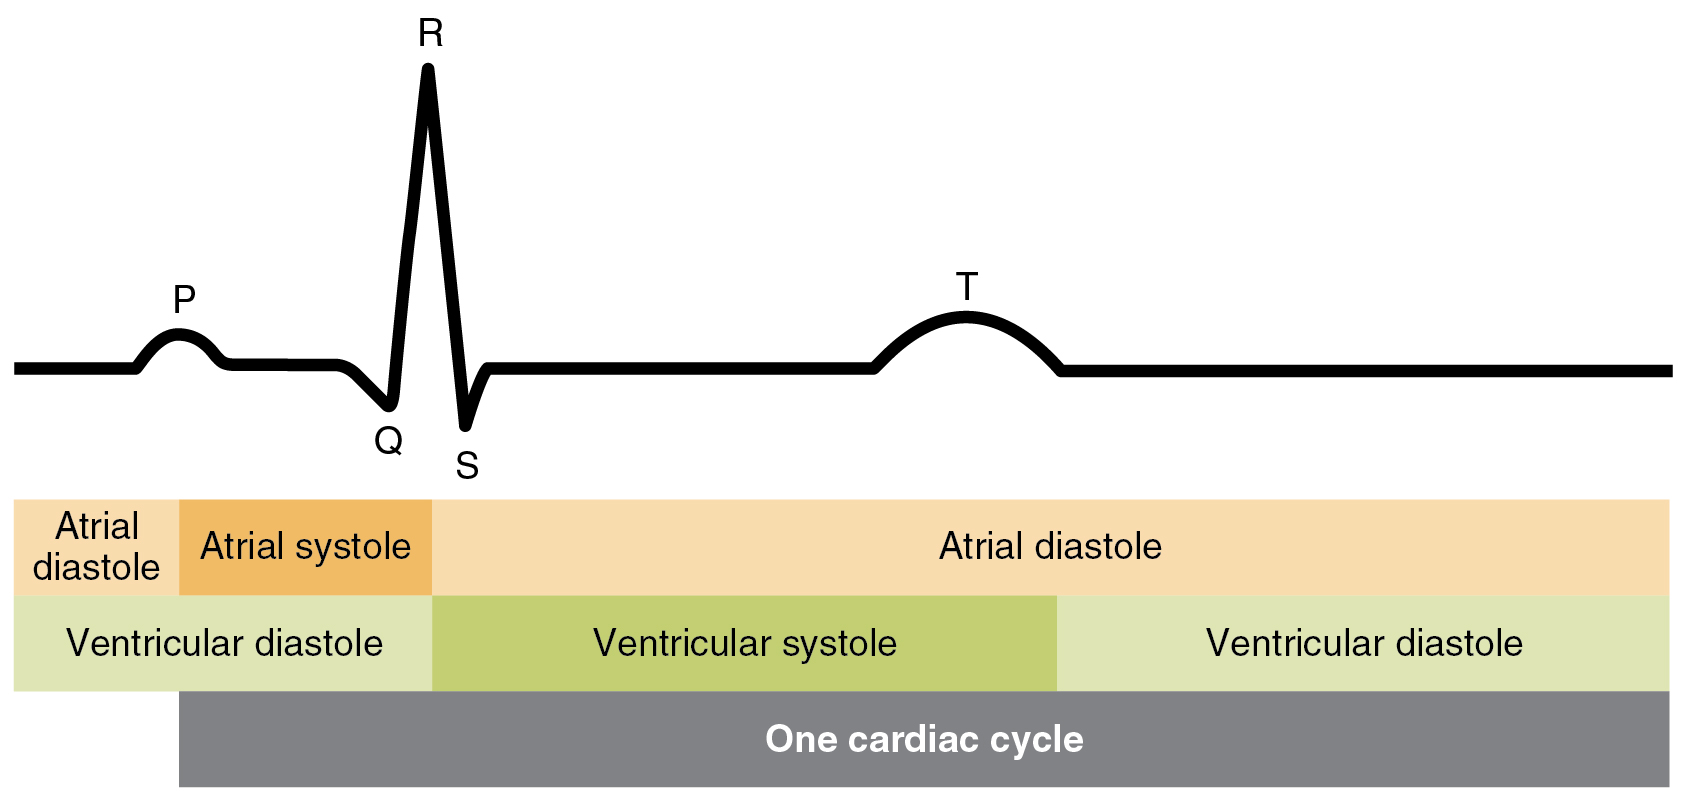 Cardiac Cycle Anatomy And Physiology